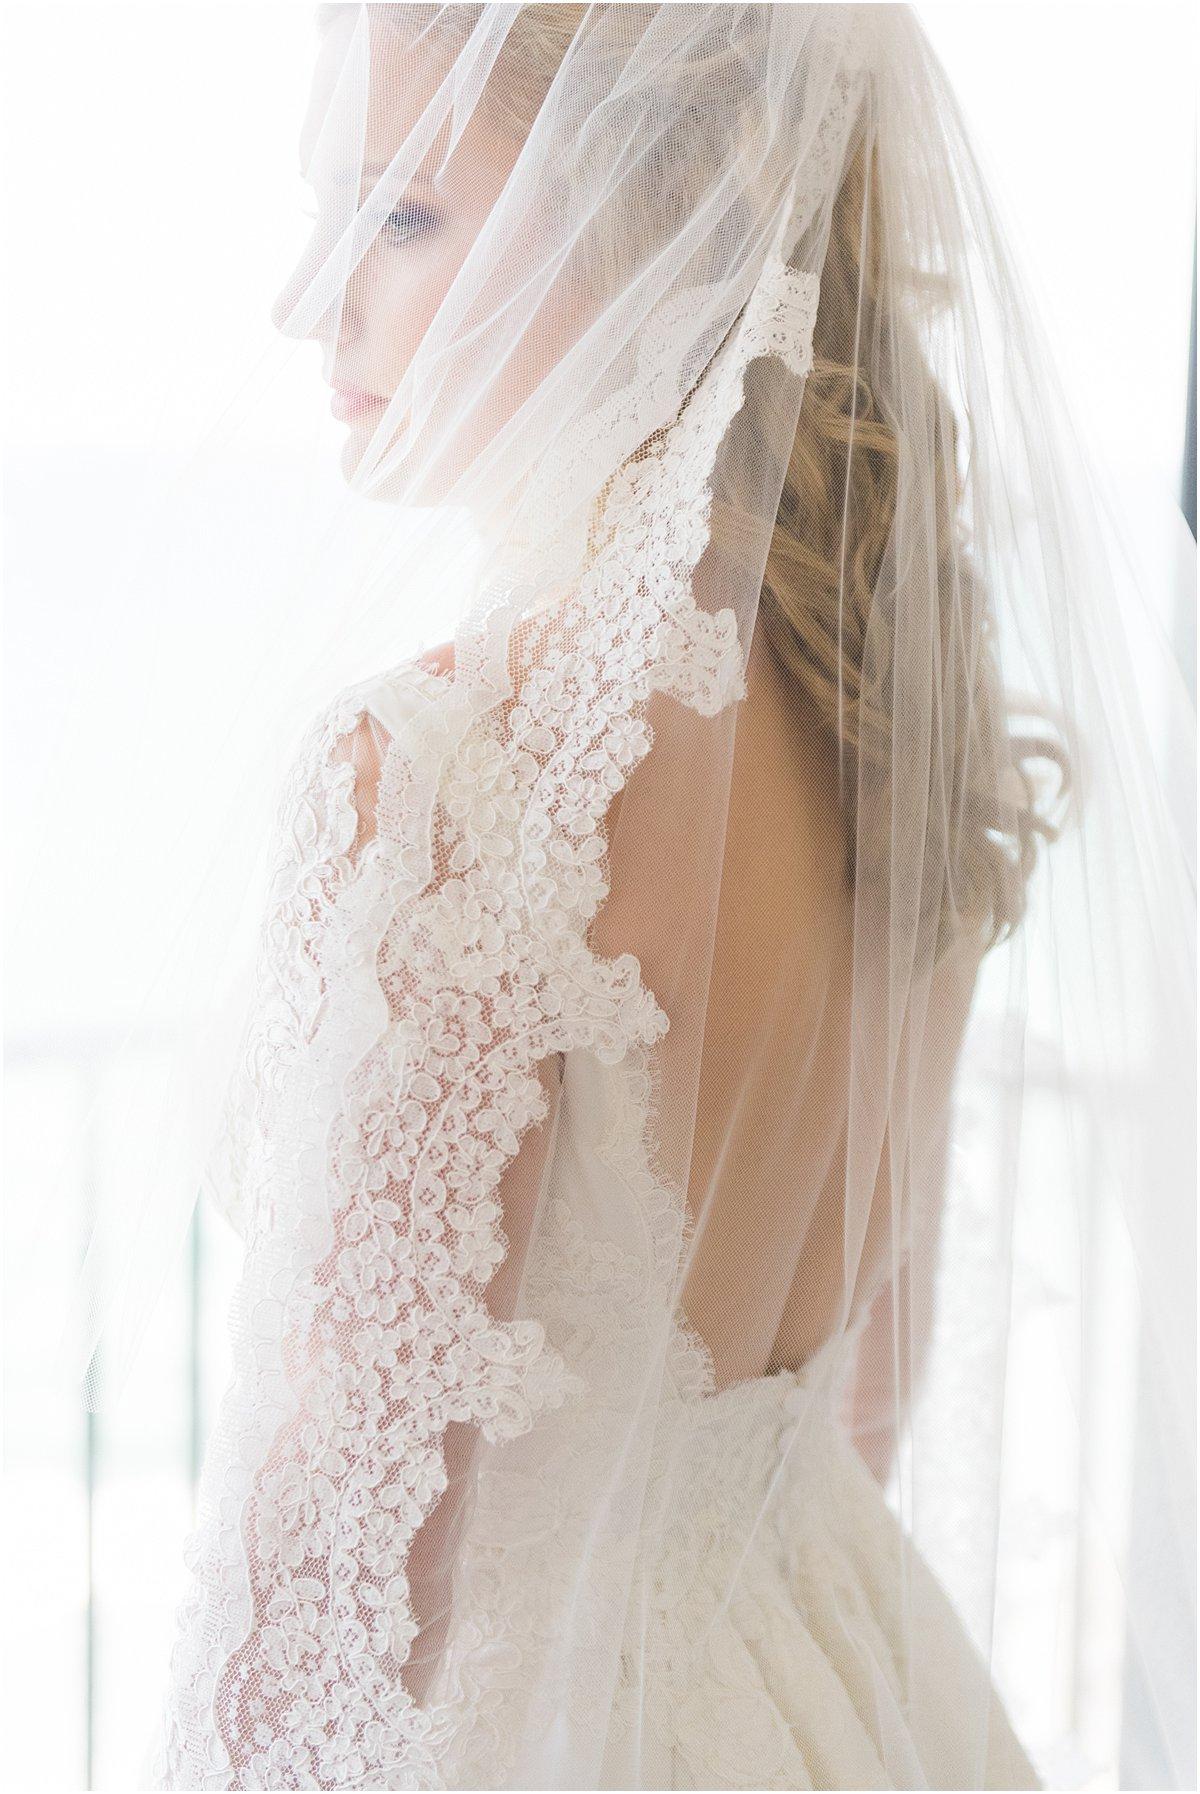 Palm Beach Wedding Photographer Instagram_shea christine photography